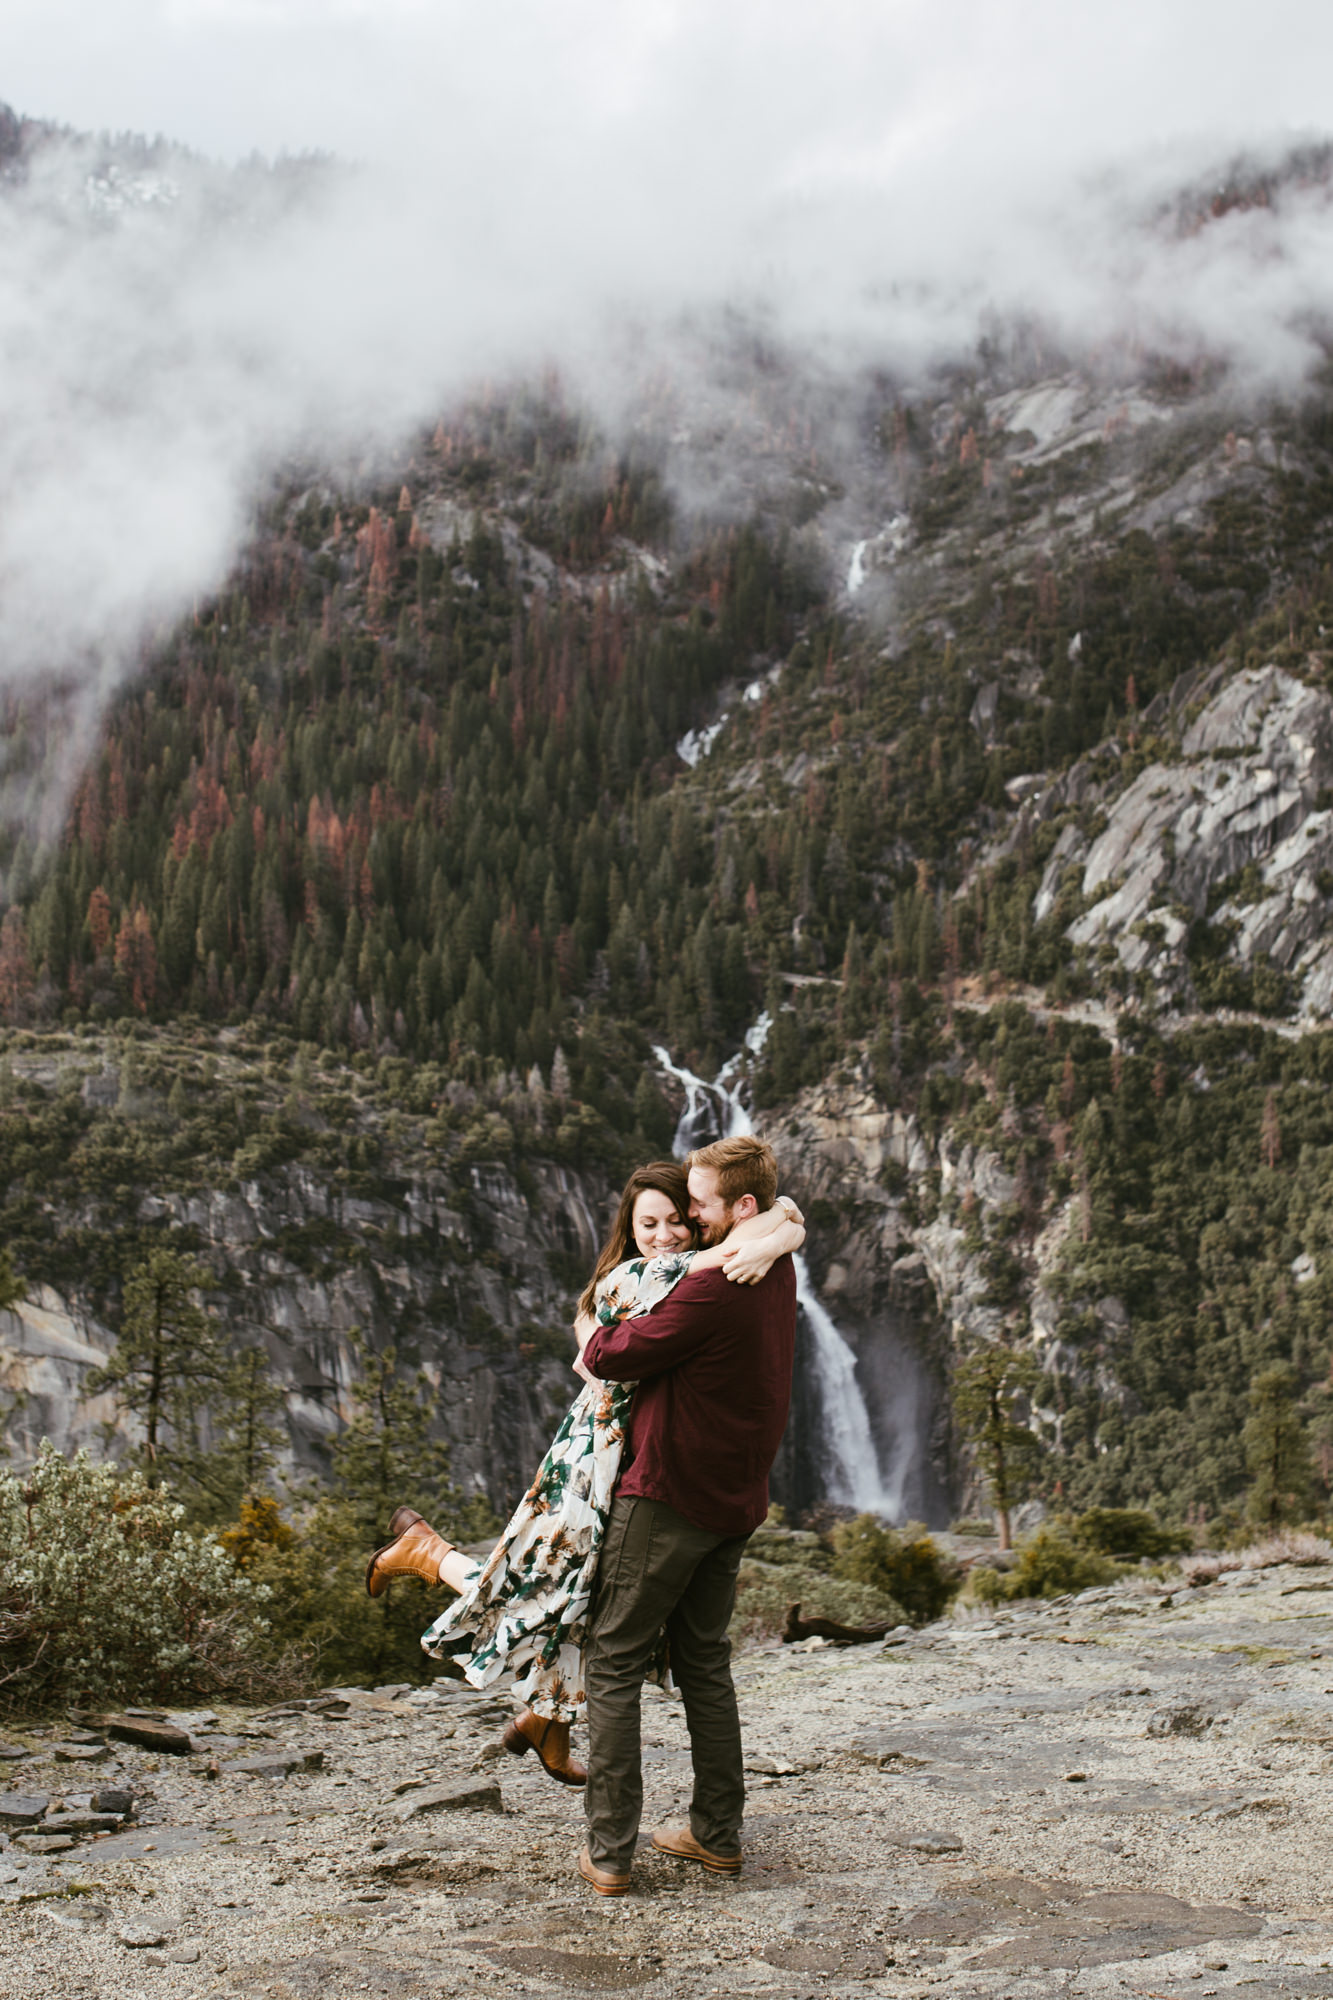 yosemite national park foggy engagement session | destination engagement photo inspiration | utah adventure elopement photographers | the hearnes adventure photography | www.thehearnes.com